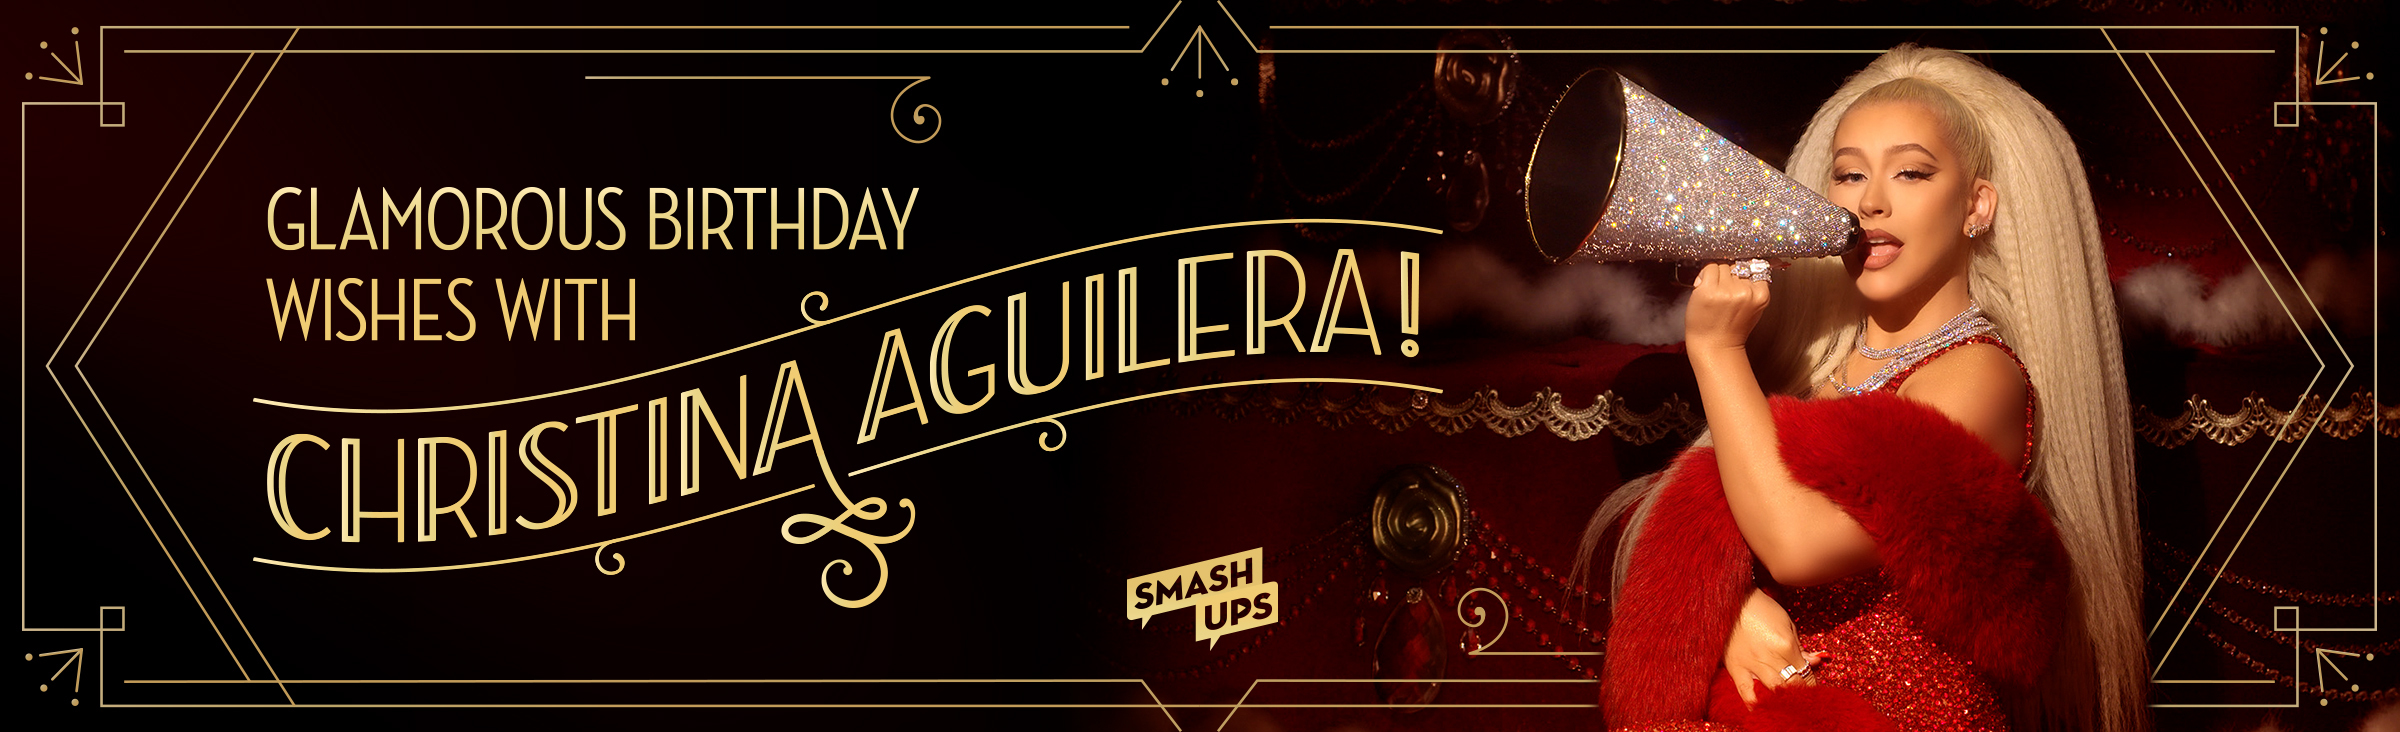 Christina Aguilera SmashUp